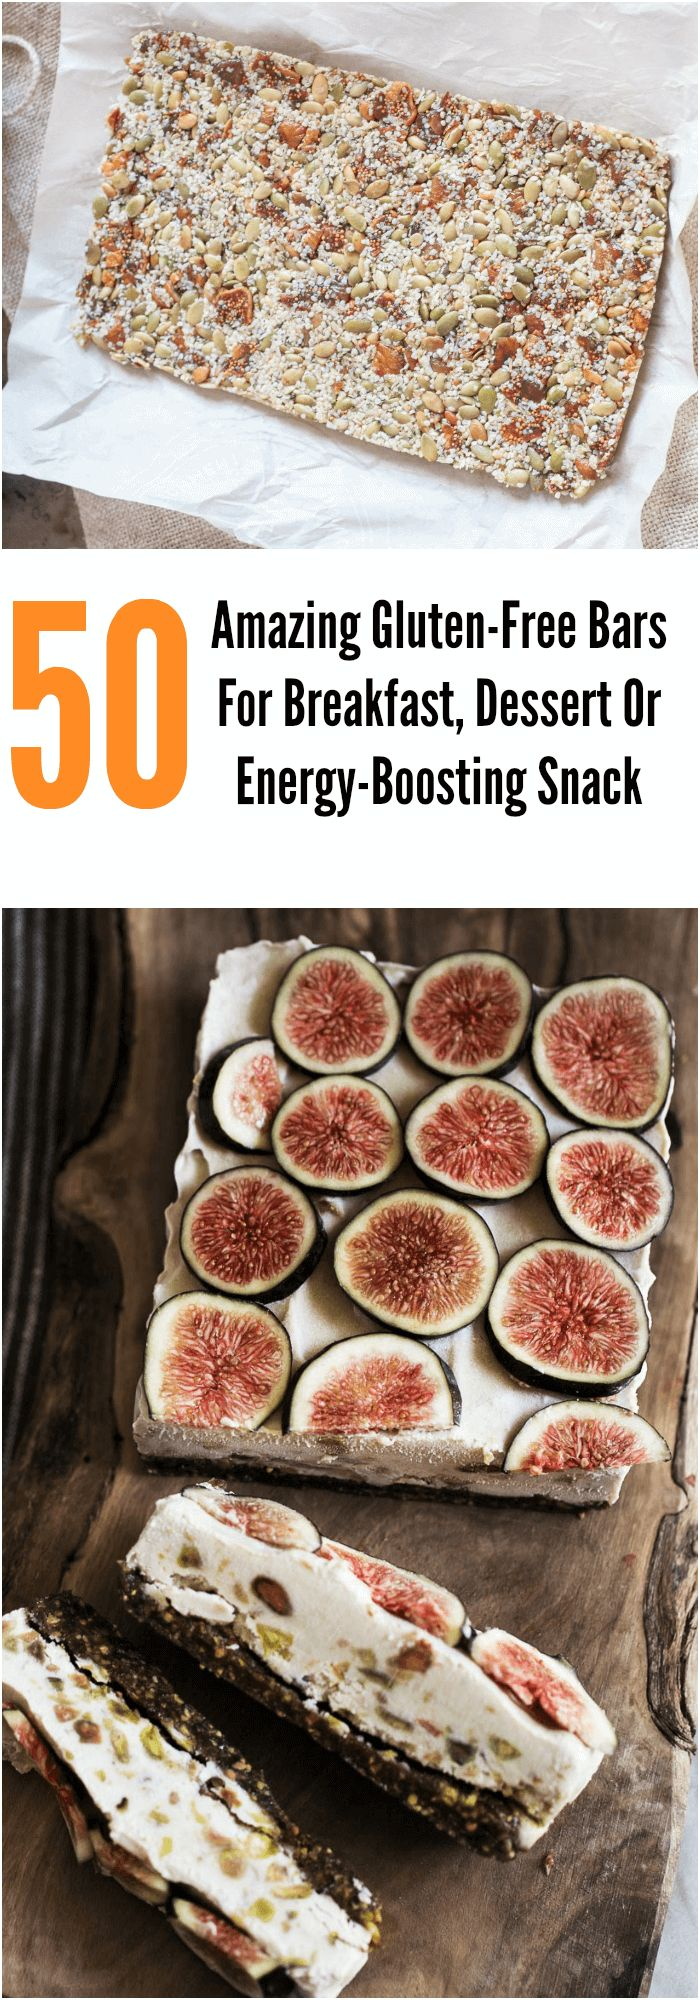 50 Amazing Gluten-Free Bars For Breakfast, Dessert Or Energy-Boosting Snack #glutenfree #breakfast #bars #desserts #recipes